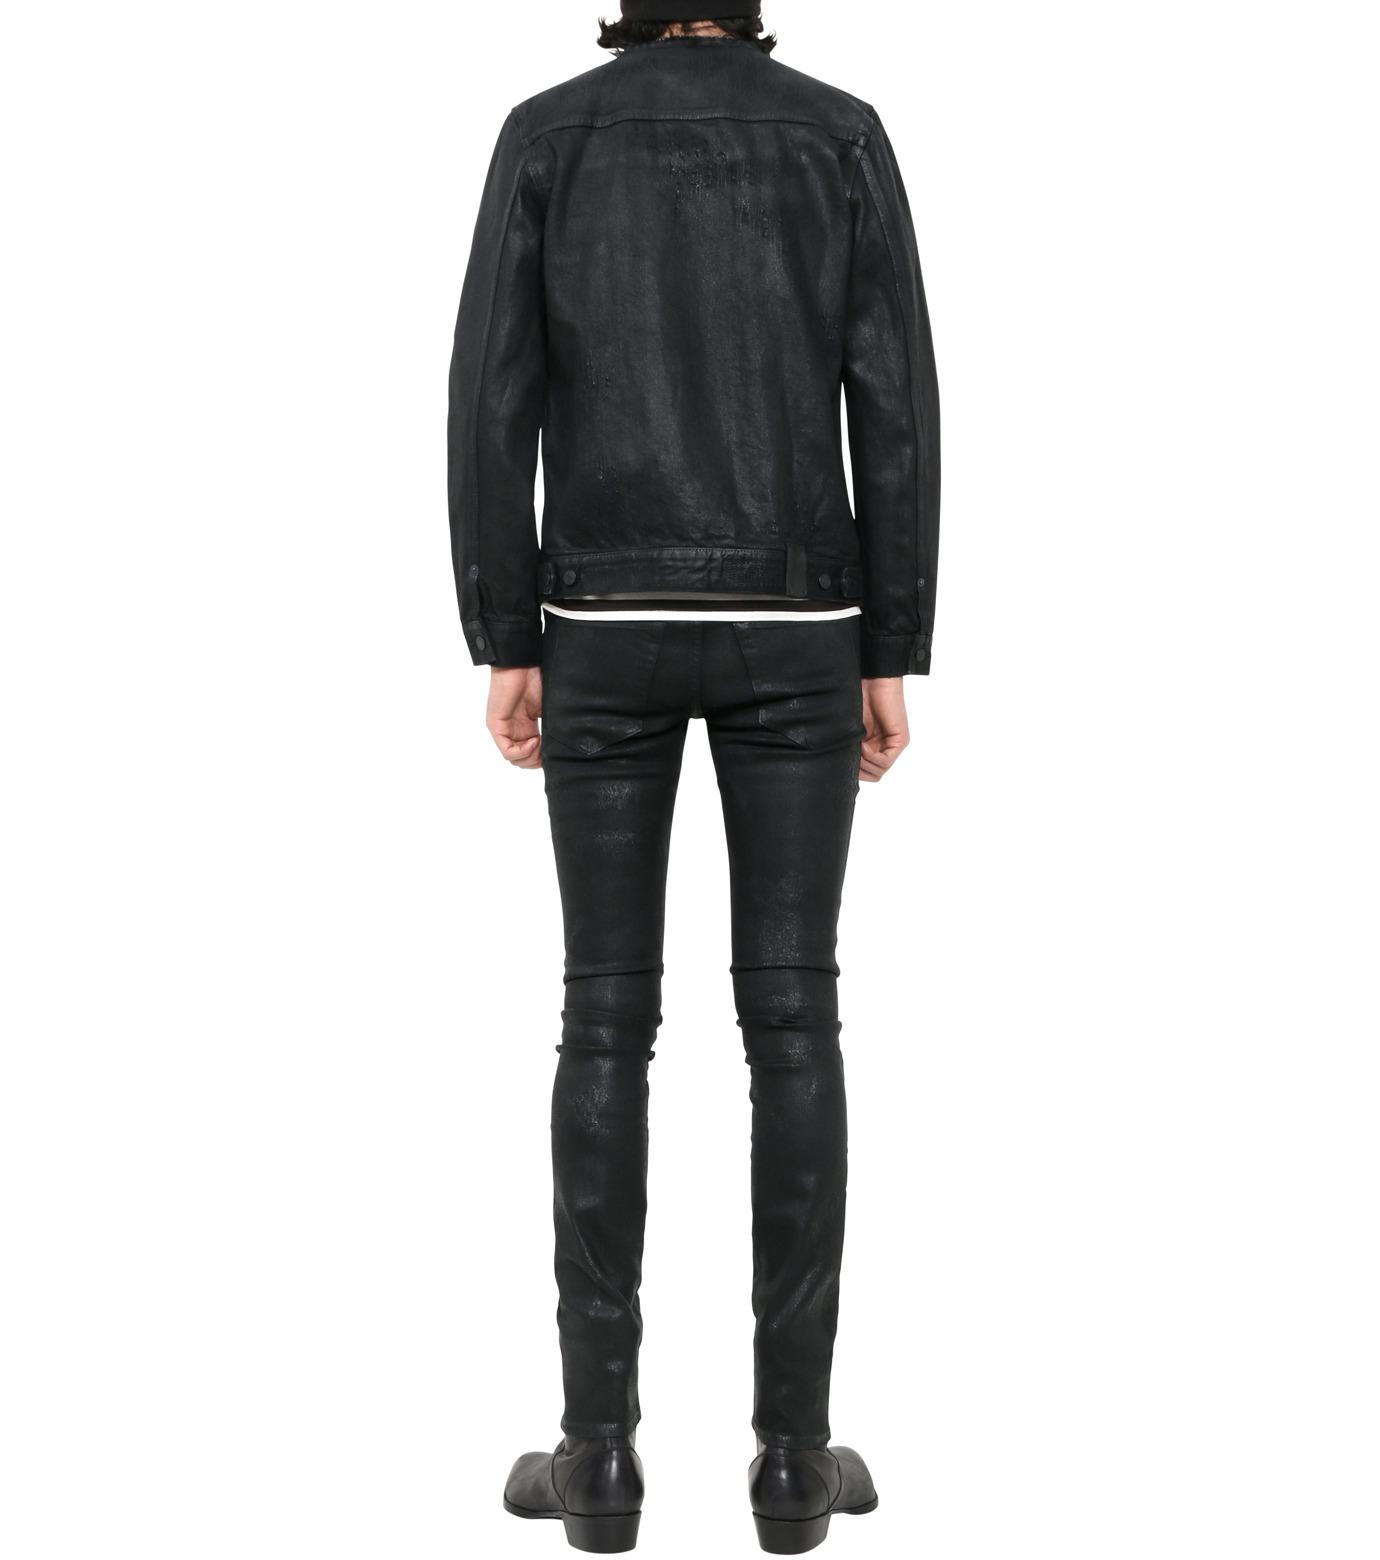 HL HEDDIE LOVU(エイチエル・エディールーヴ)のCOLLARLESS DENIM JACKET-BLACK(ジャケット/jacket)-18S94007-13 拡大詳細画像2